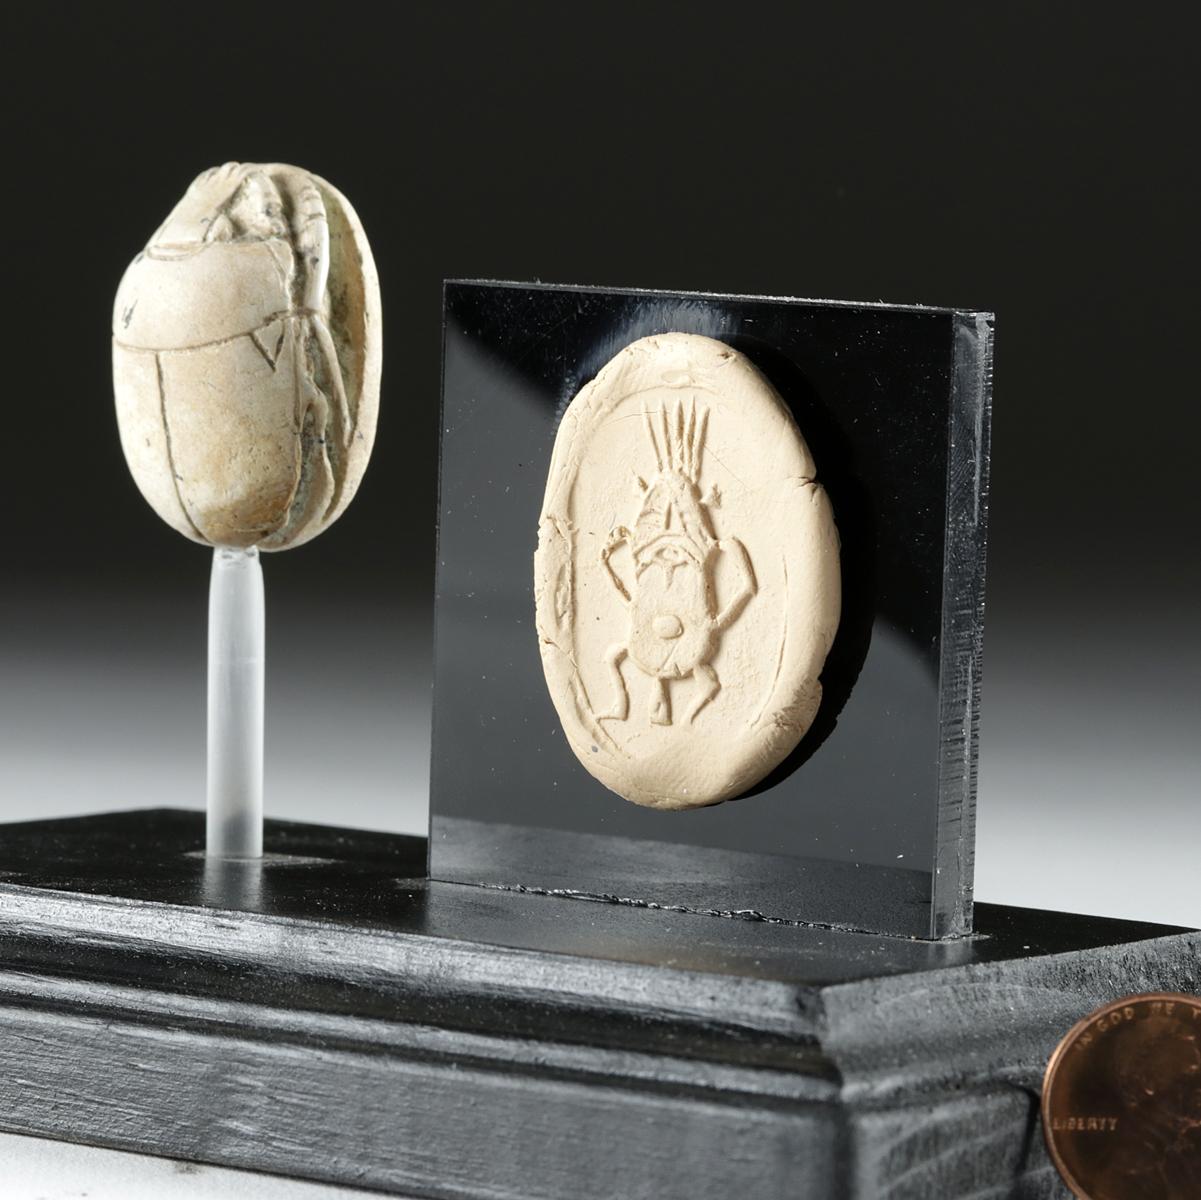 Lot 6b - Egyptian Glazed Steatite Scarab Amulet w/ Bes Engraving